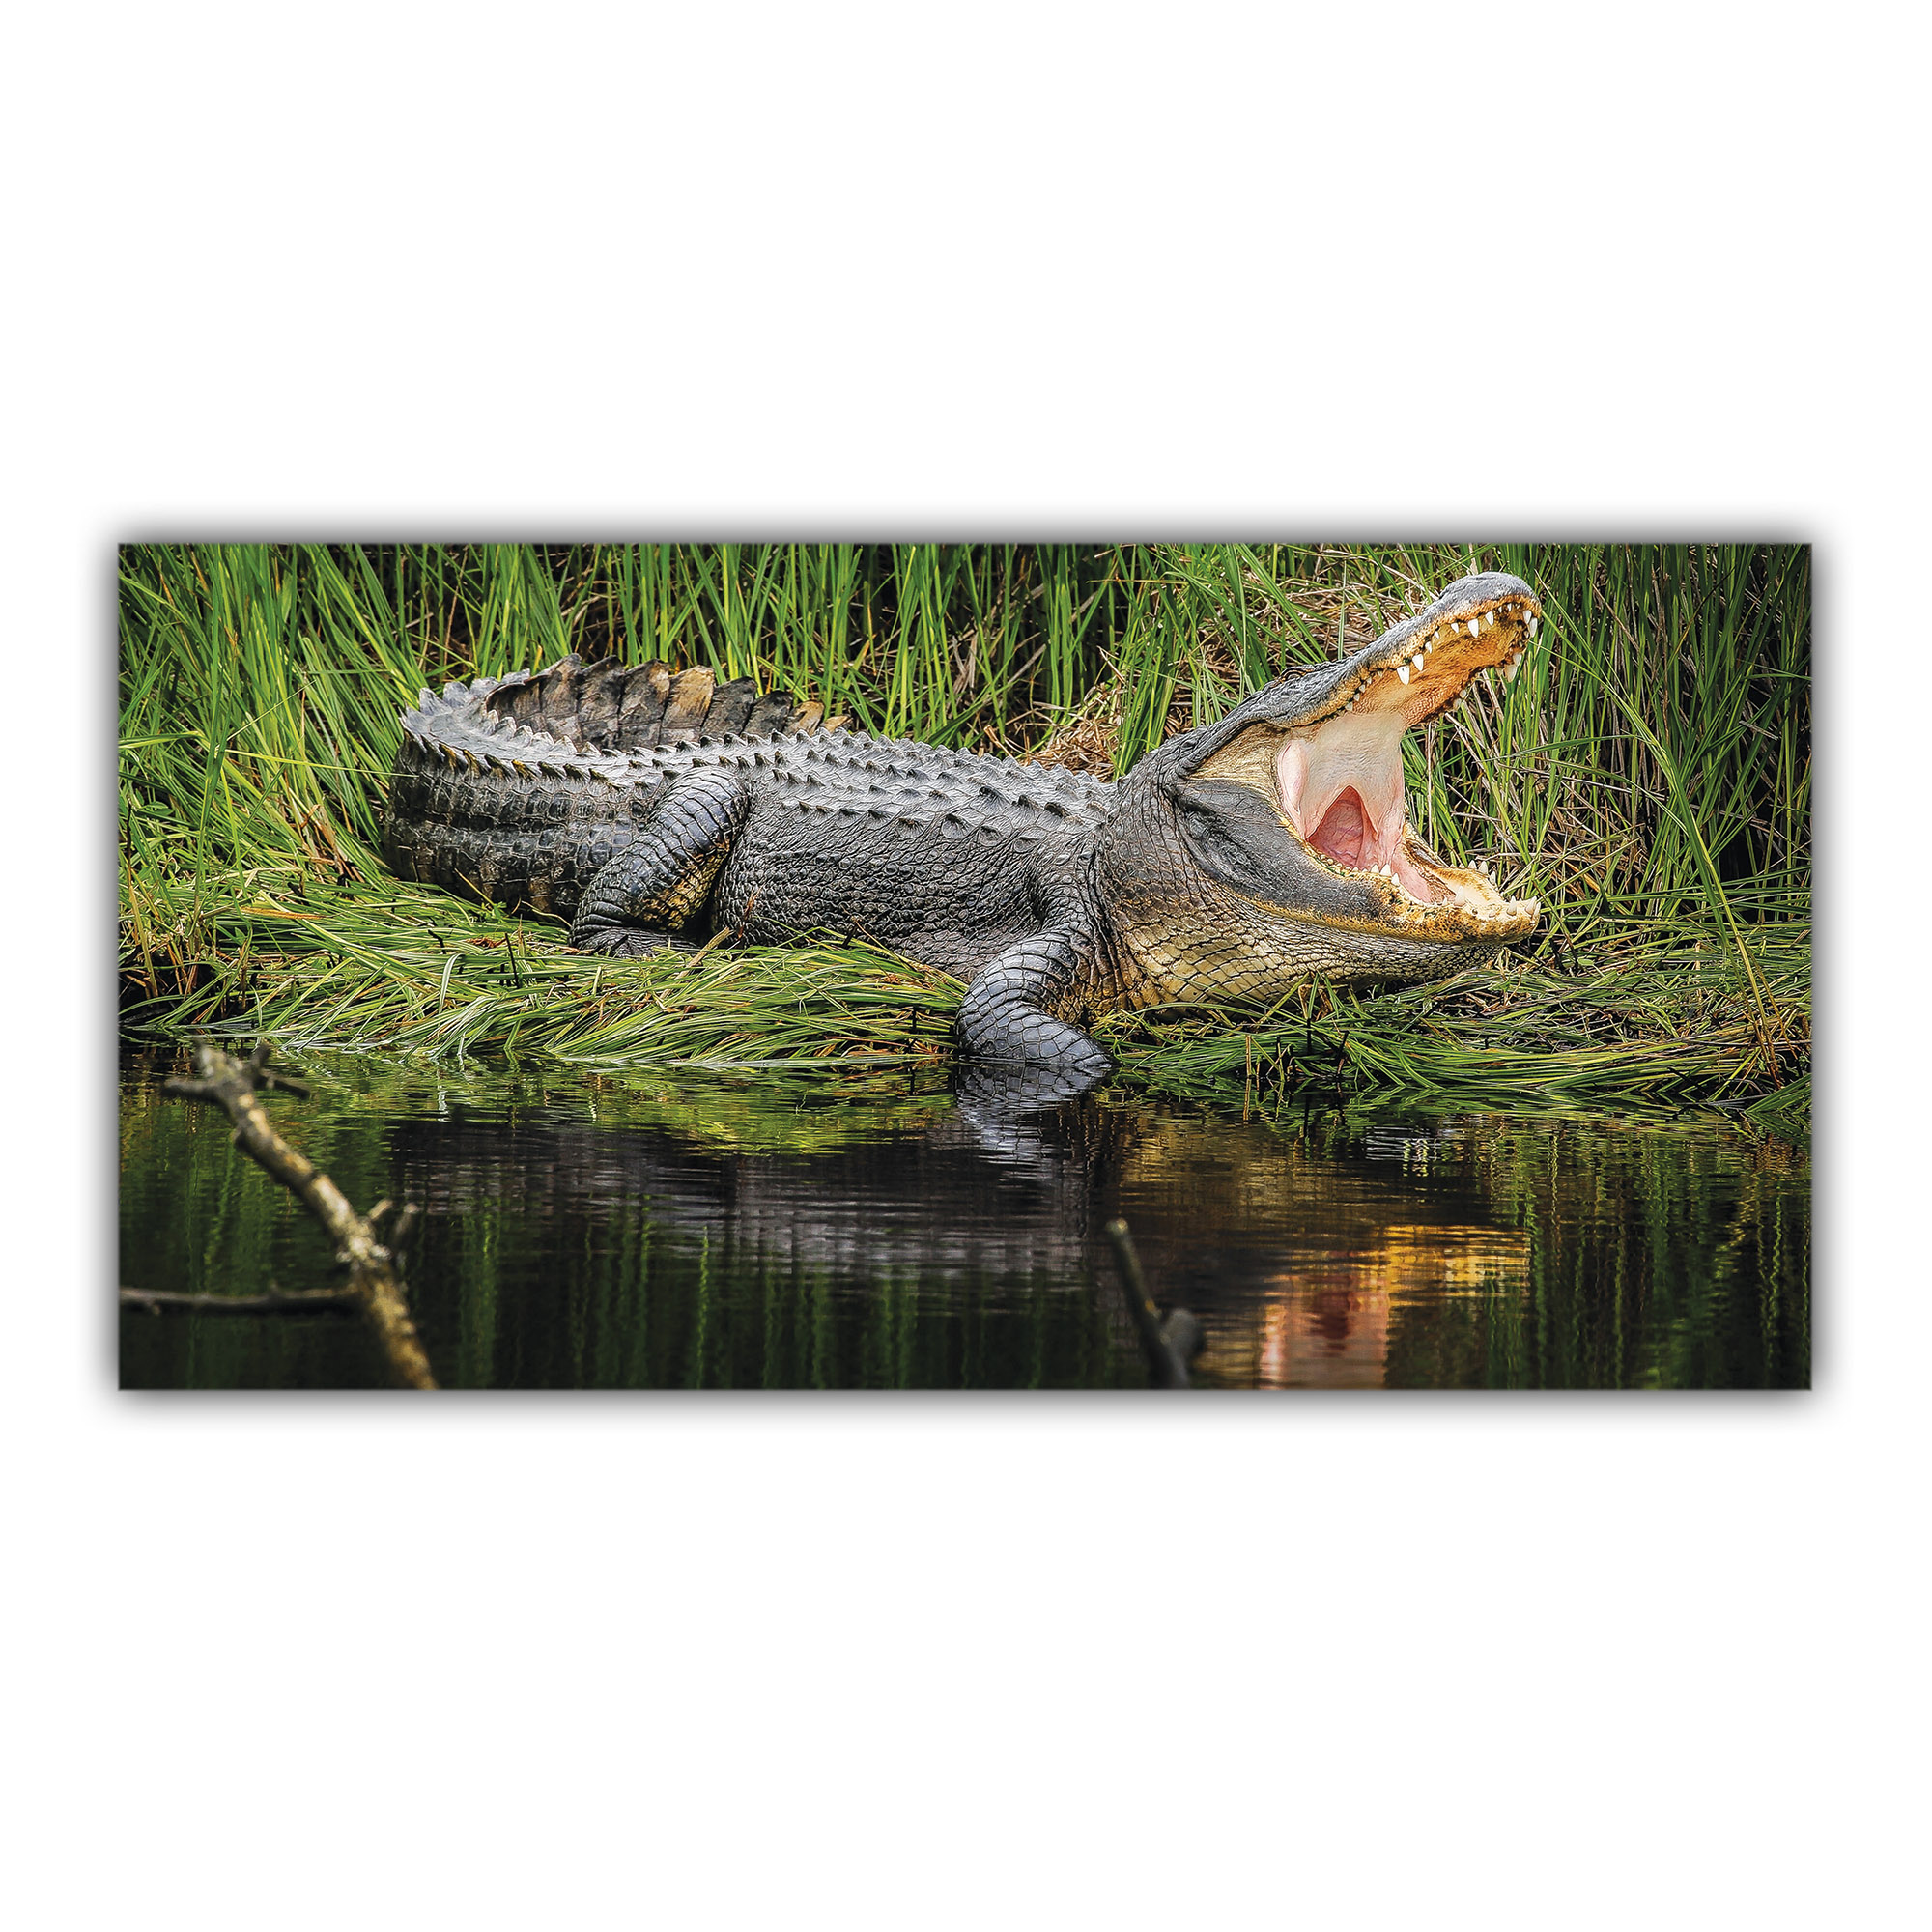 Crocodile au bord de la Rivière